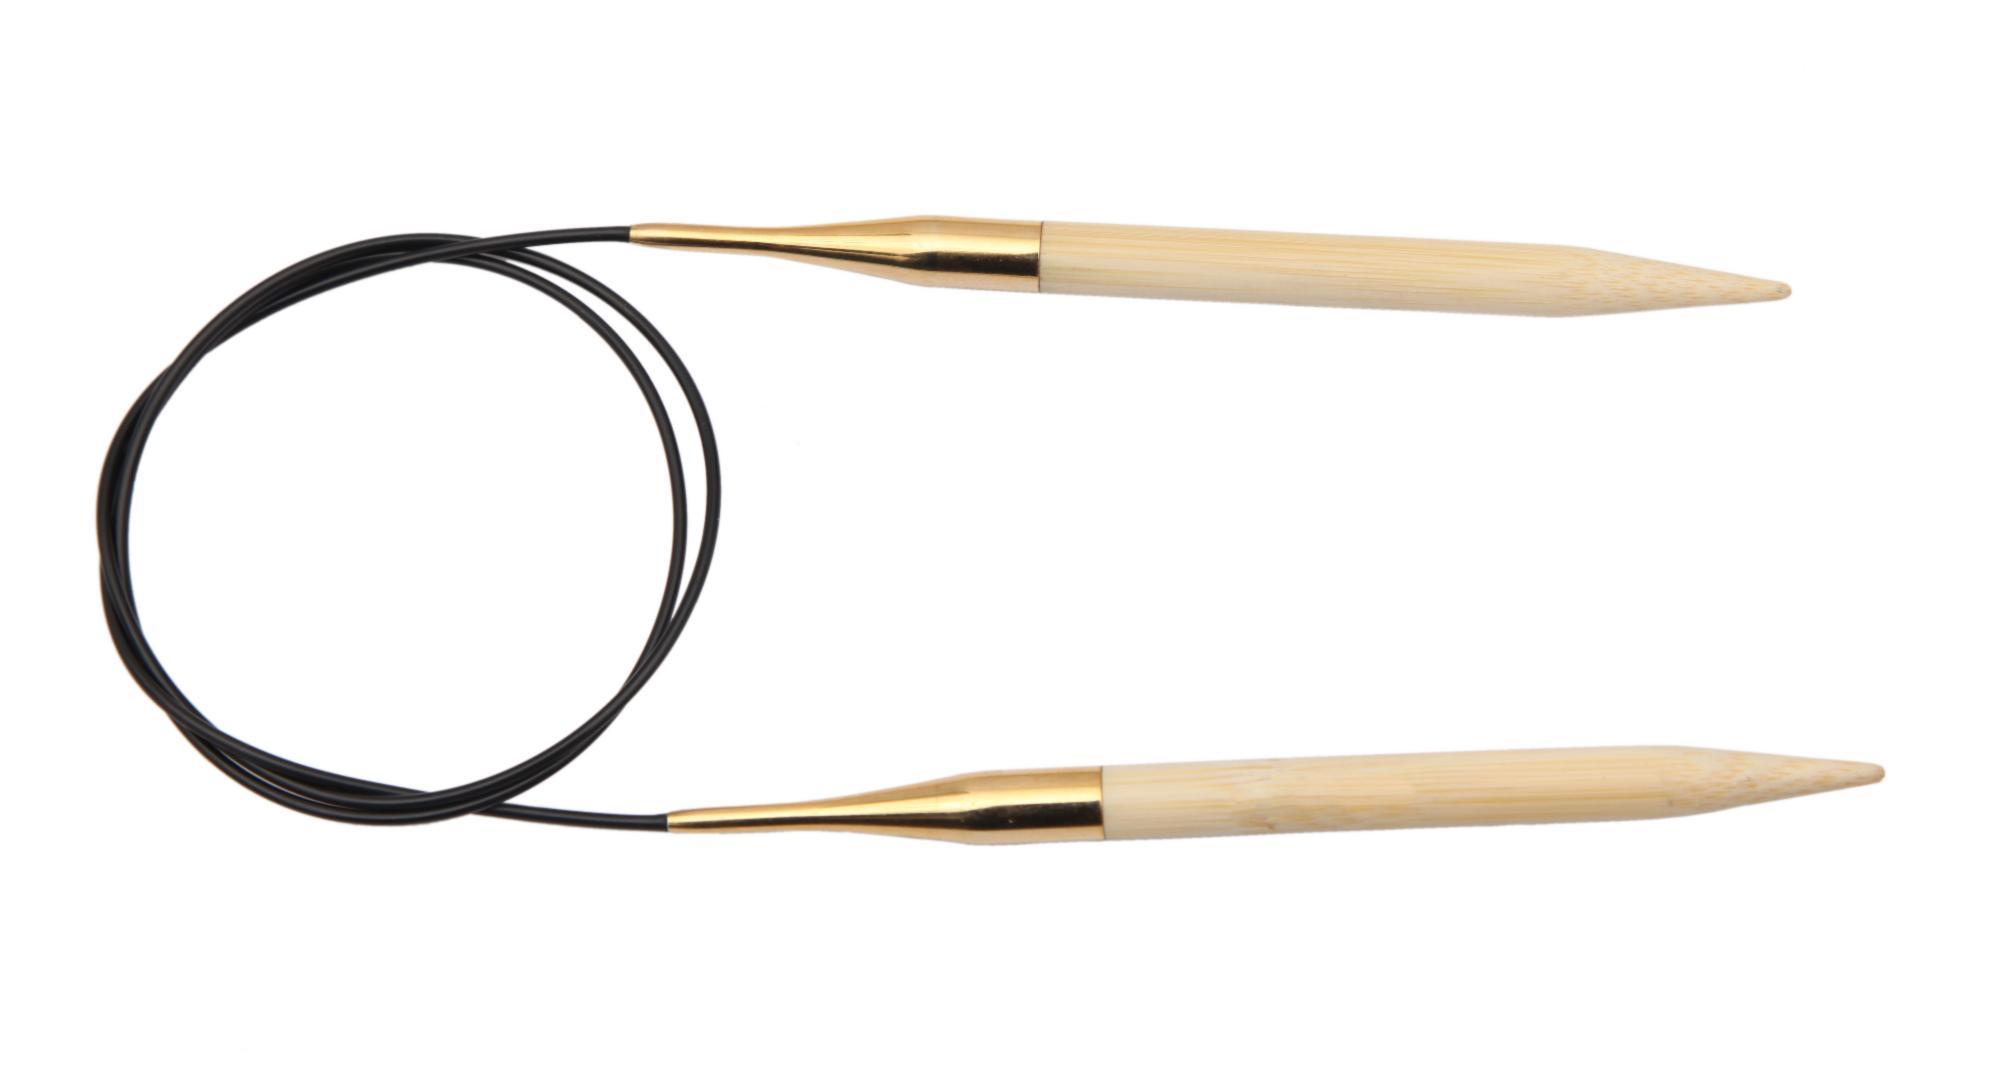 Спицы круговые 80 см Bamboo KnitPro, 22250, 5.50 мм